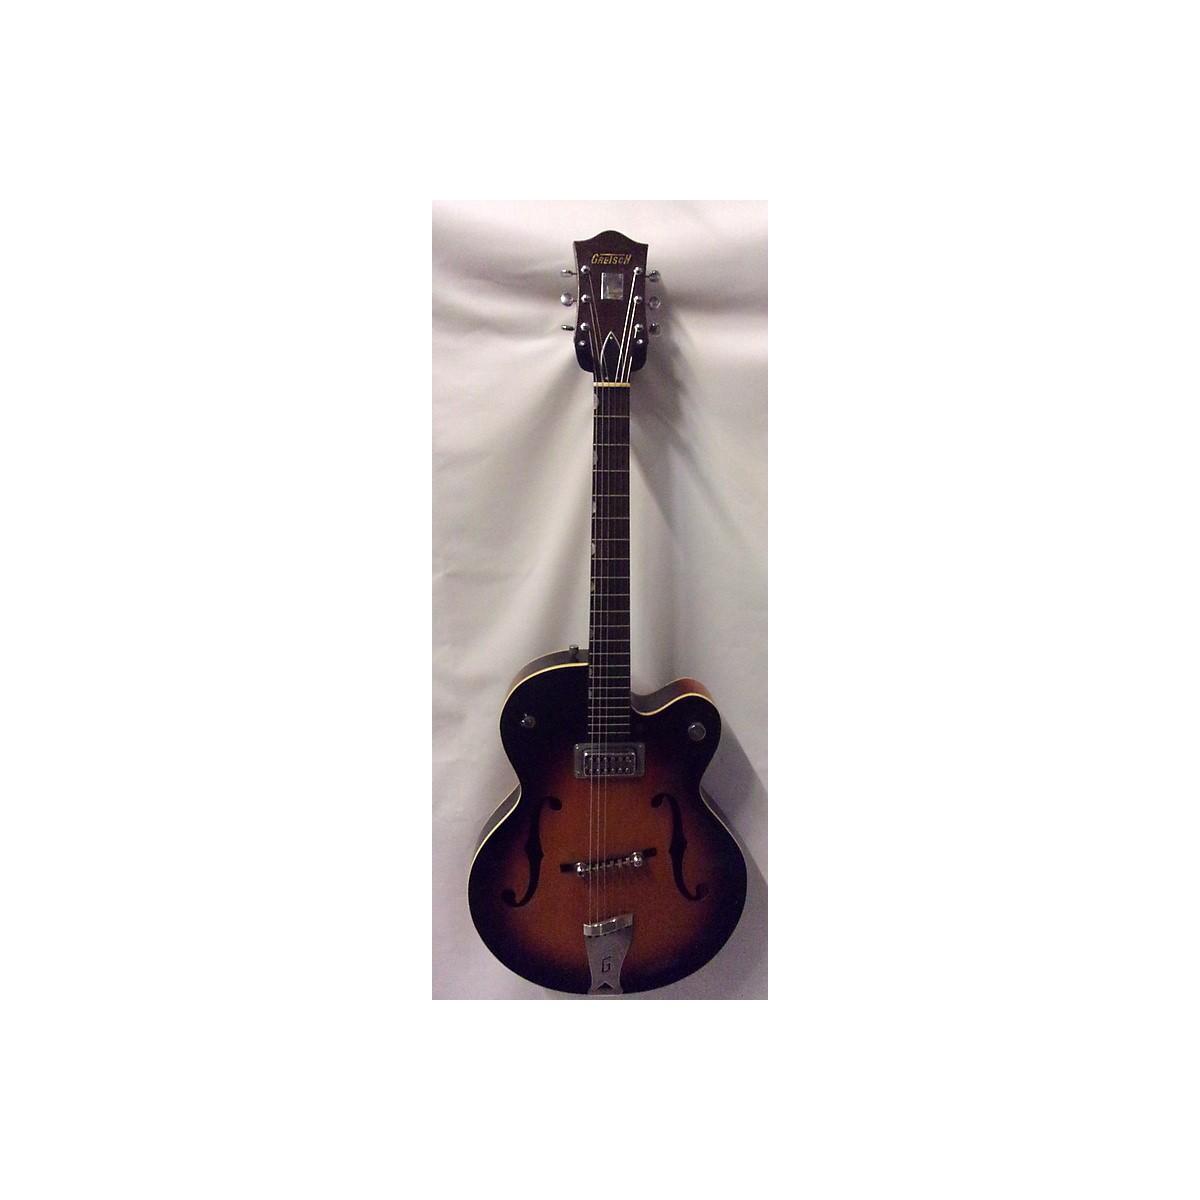 Gretsch Guitars 1959 Anniversary Hollow Body Electric Guitar